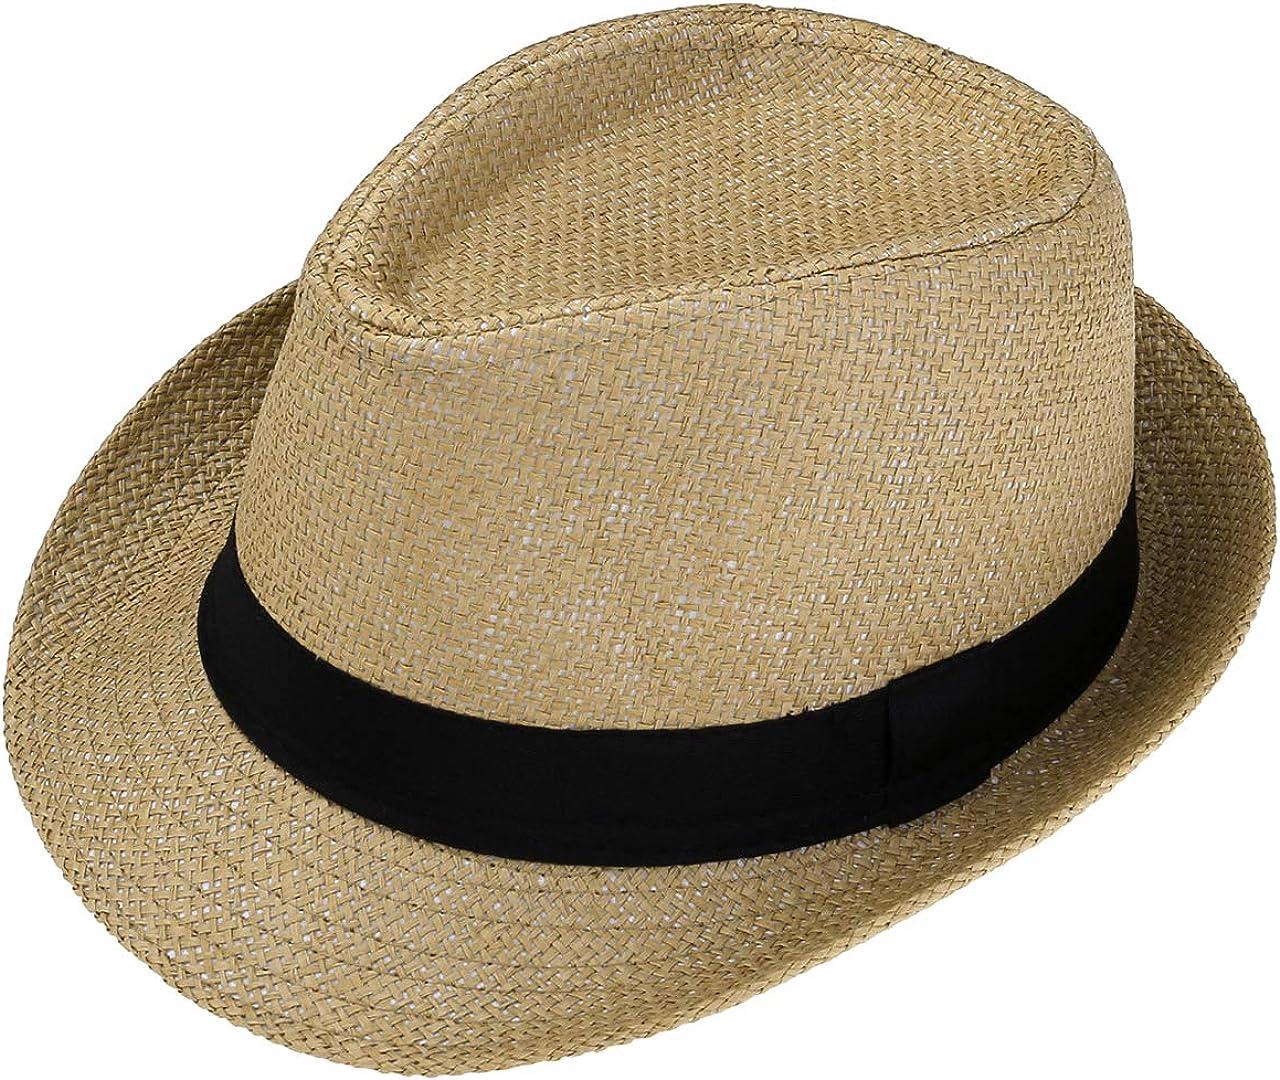 FALETO Unisex Summer Panama Straw Fedora Hat Short Brim Beach Sun Cap Classic